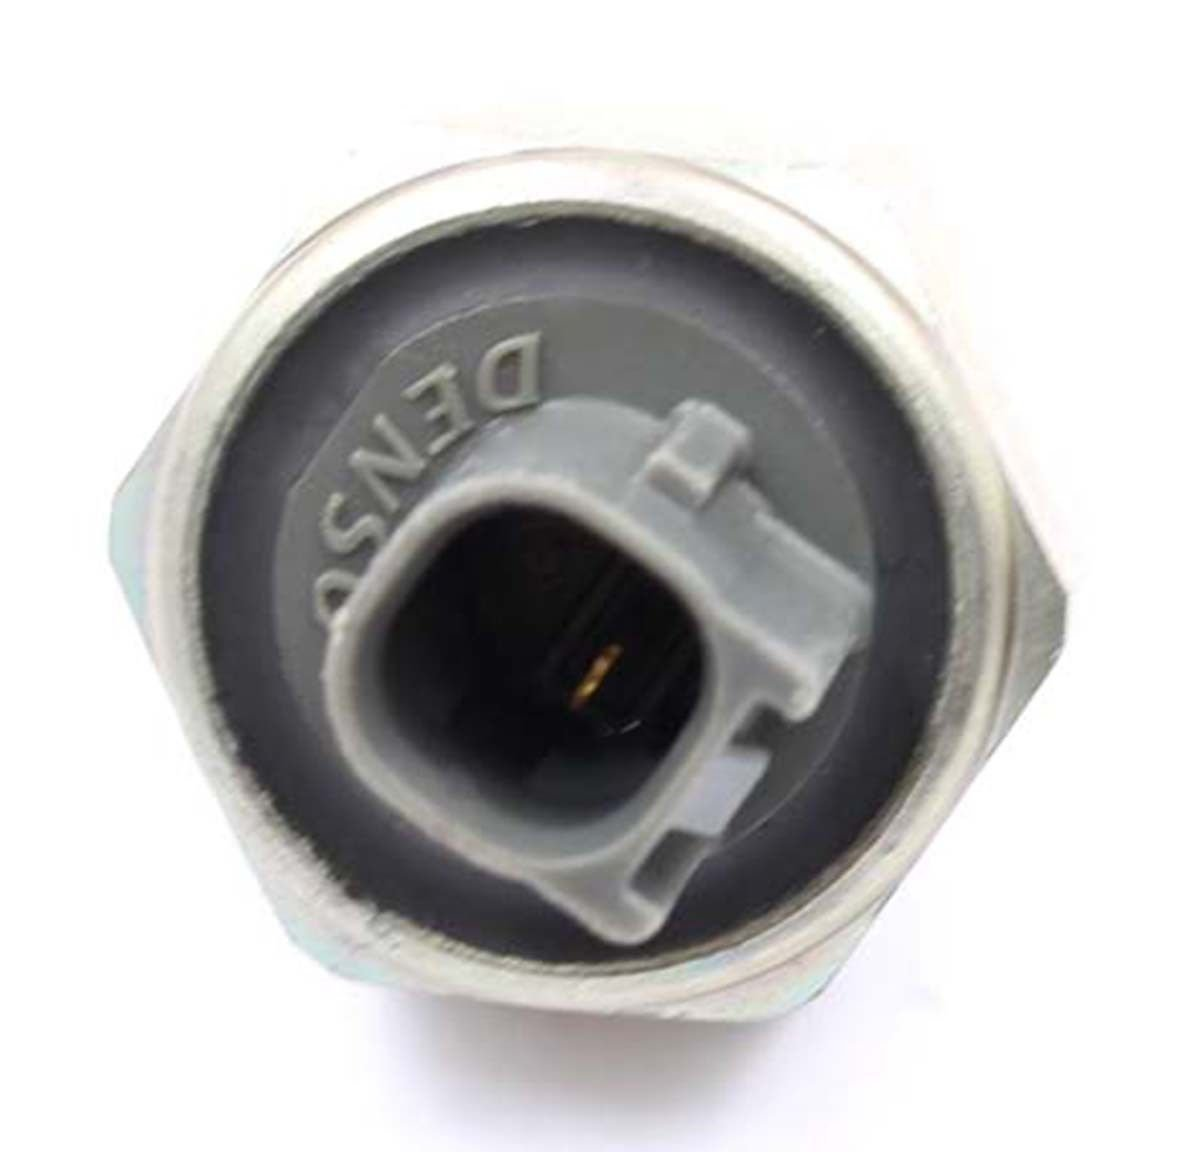 2 Pcs Genuine Denso Knock Sensor Part 89615-12090 For Toyota Lexus